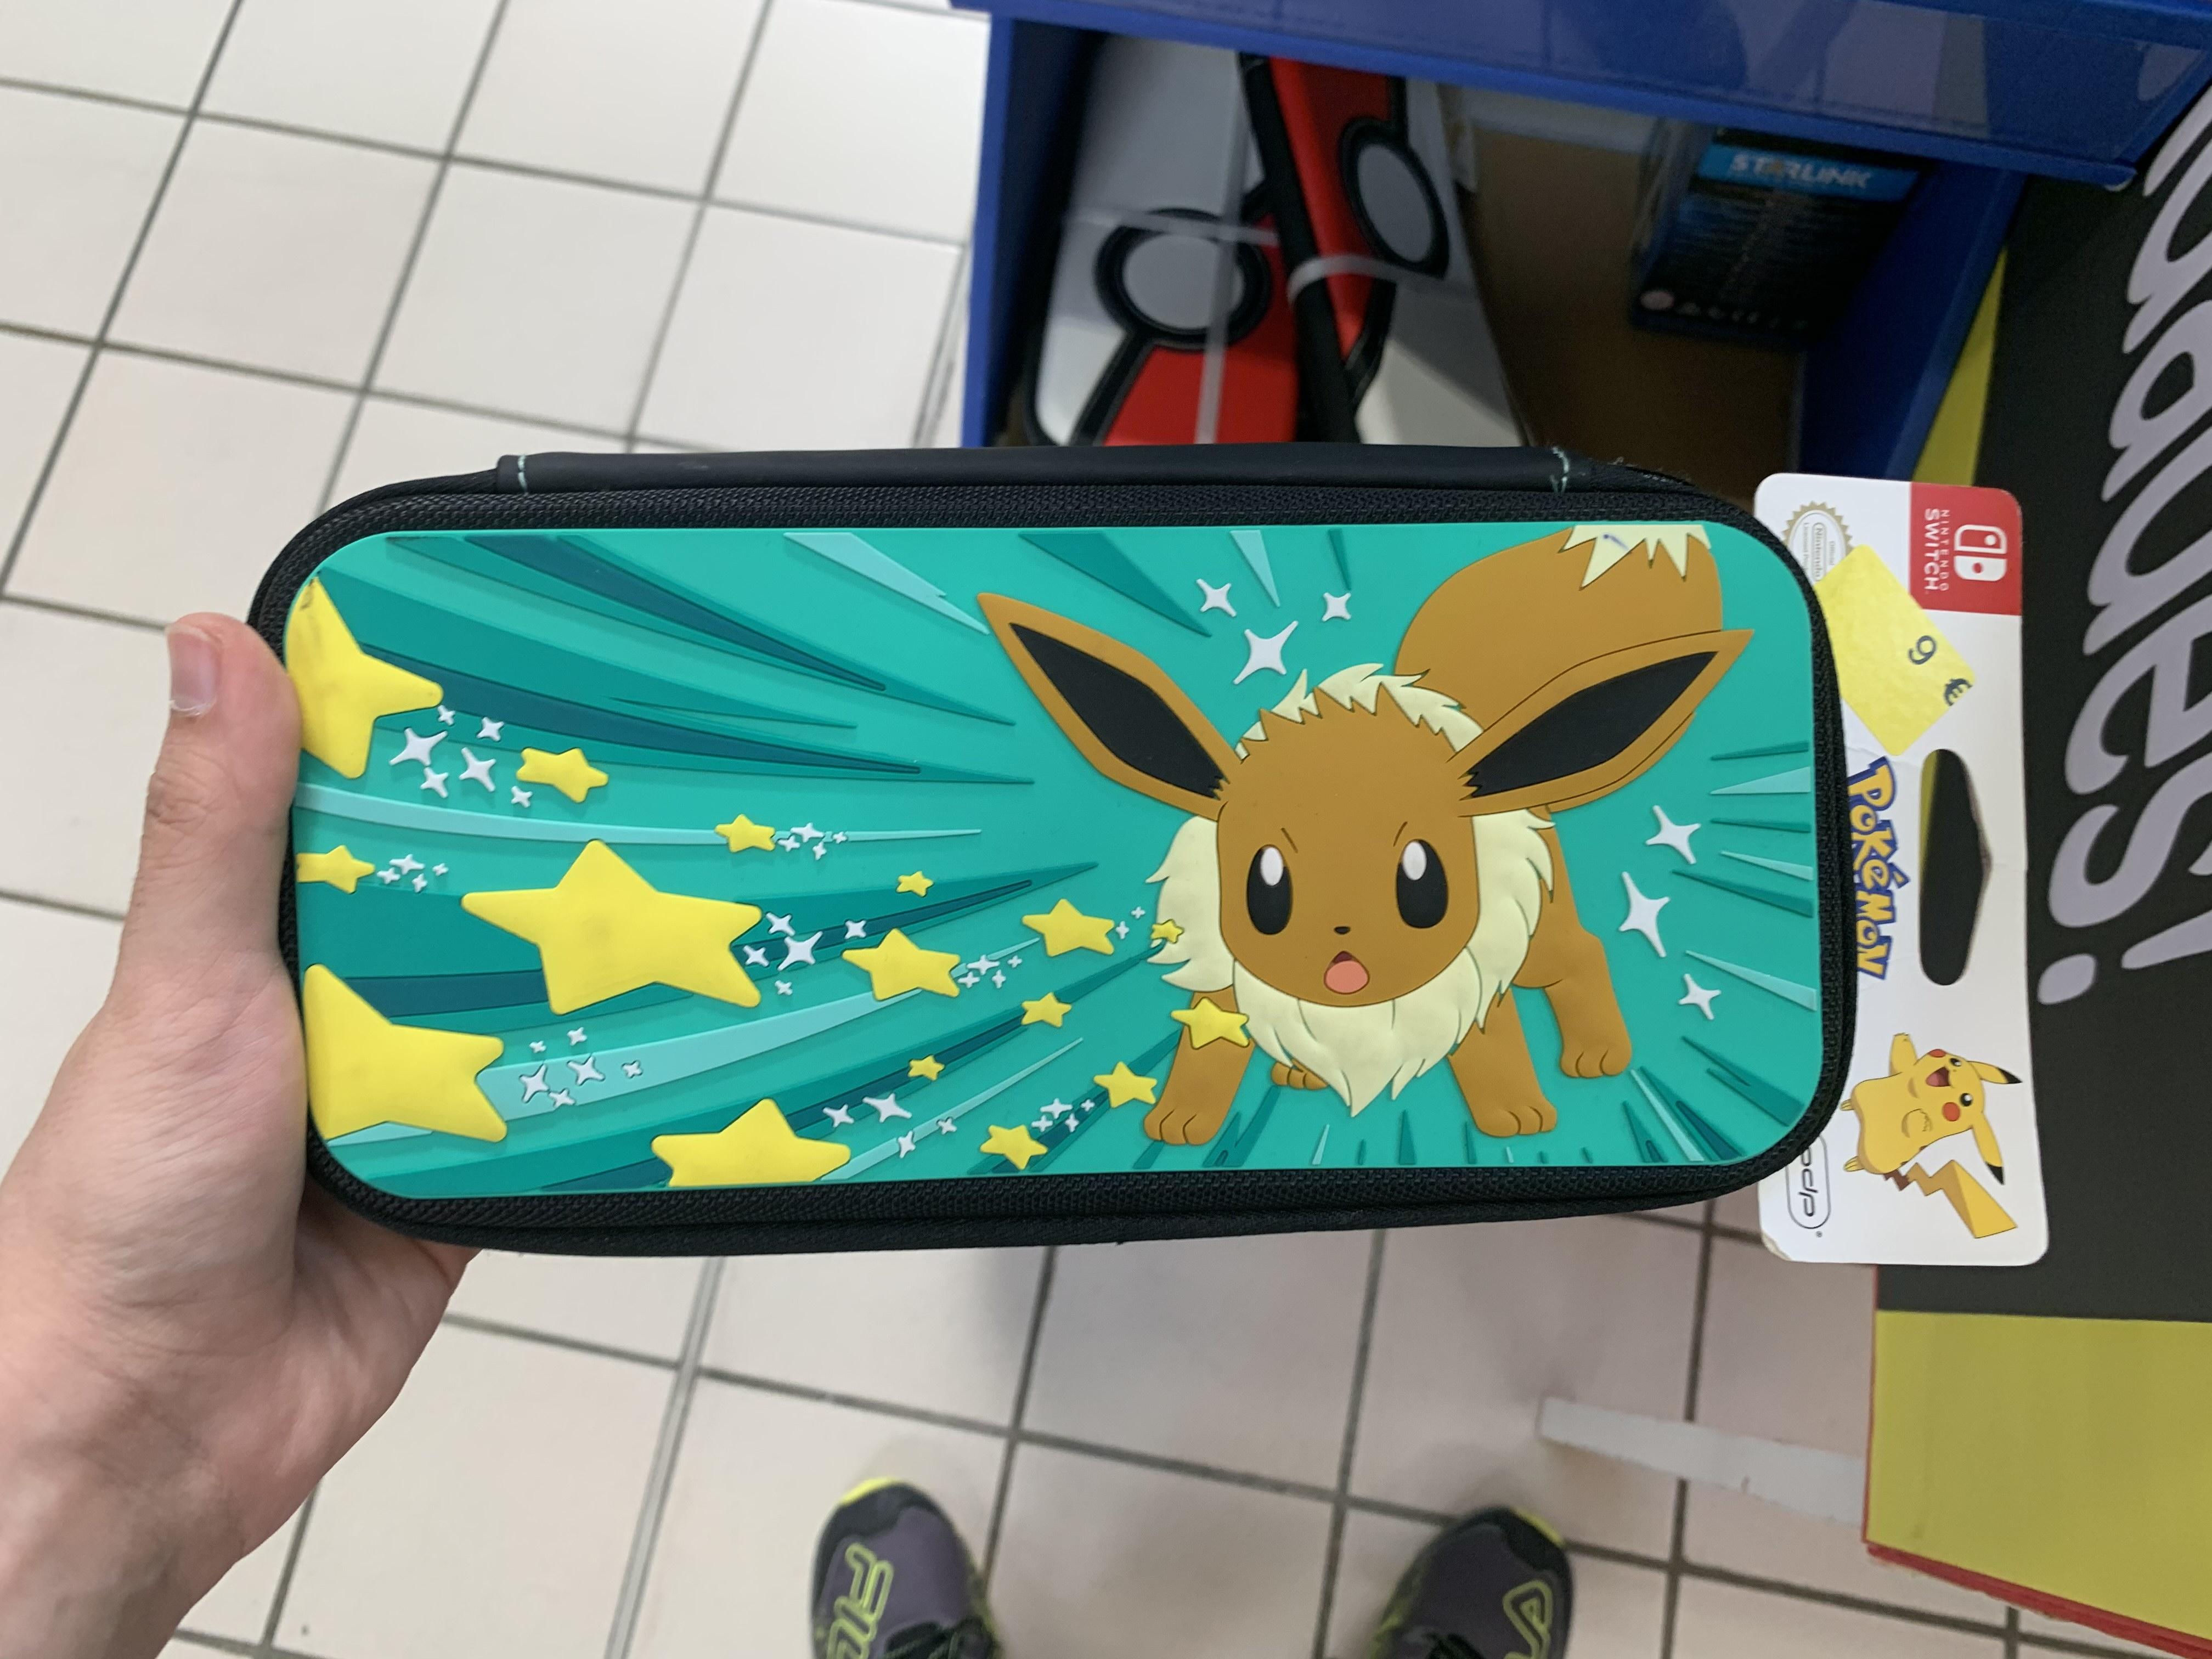 PDP Funda Travel Case Eevee, Nintendo Switch (Carrefour Lorca)